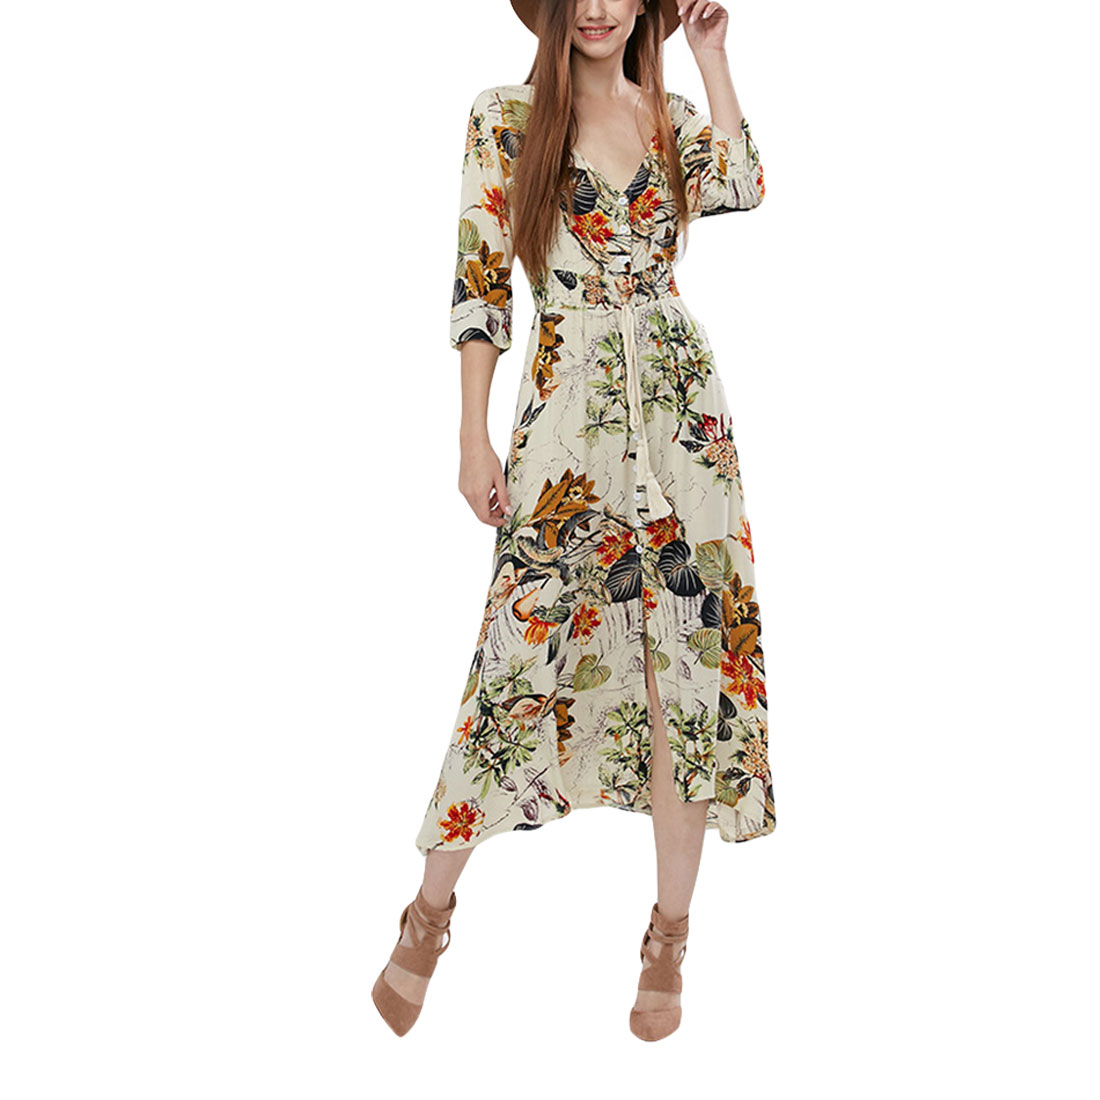 JIMMYHANK Women Summer Casual V Neck 3/4 Sleeve Floral Print Buttom Vacation Beach Maxi Dress